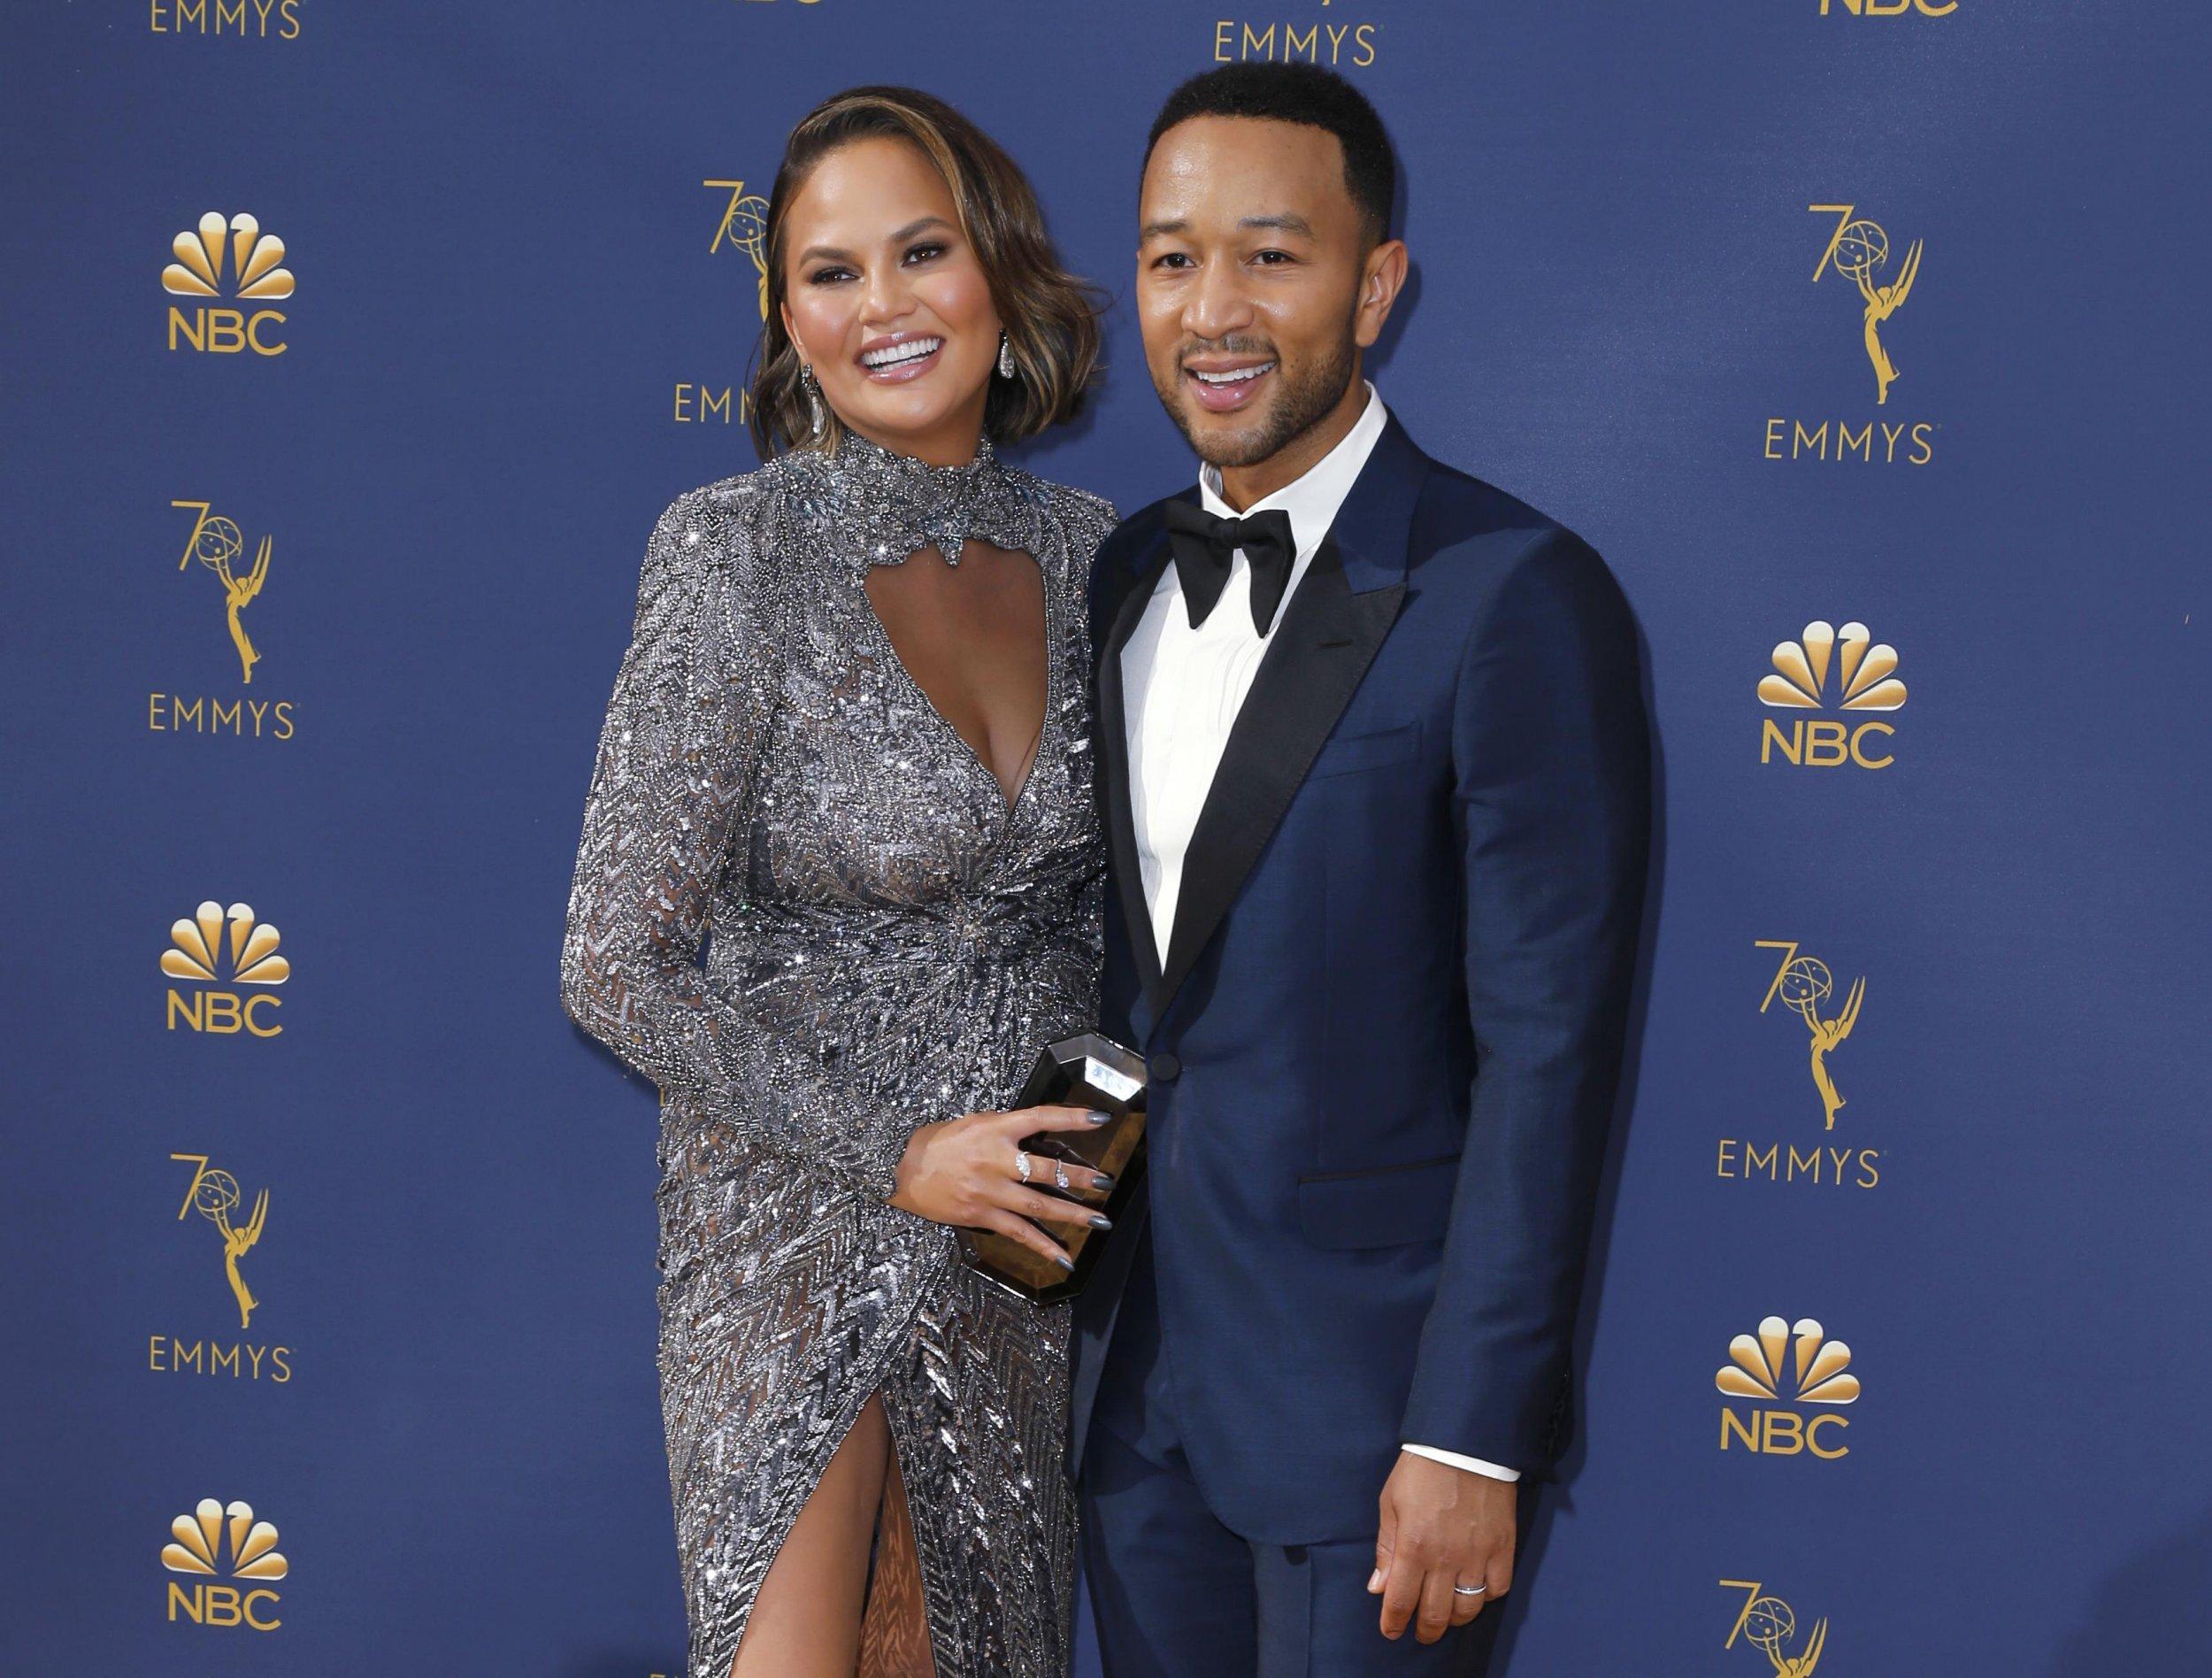 70th Primetime Emmy Awards??? Arrivals ??? Los Angeles, California, U.S., 17/09/2018 ??? Chrissy Teigen and John Legend. REUTERS/Kyle Grillot